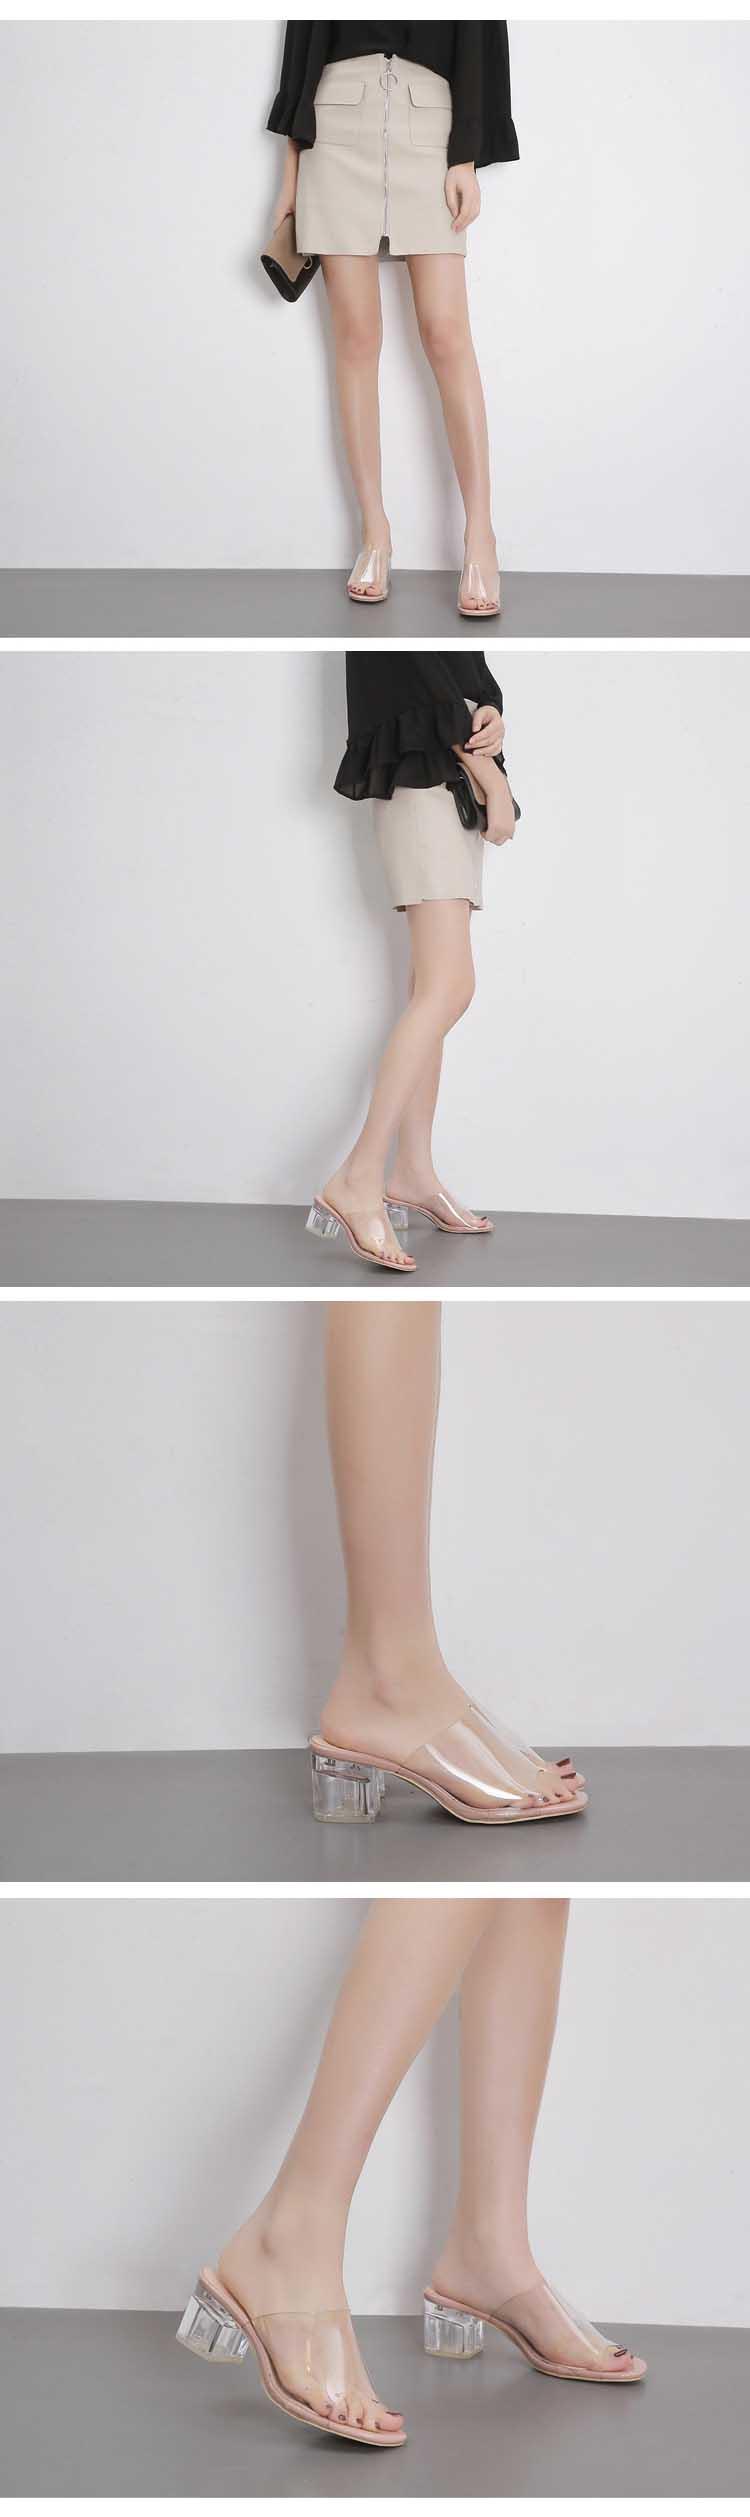 HTB1XtGvf9BYBeNjy0Feq6znmFXaE Eilyken 2019 Summer Gladiator Sandals Women Leisure Crystal Square heel slippers Fashion Women's Sandals Slides shoes